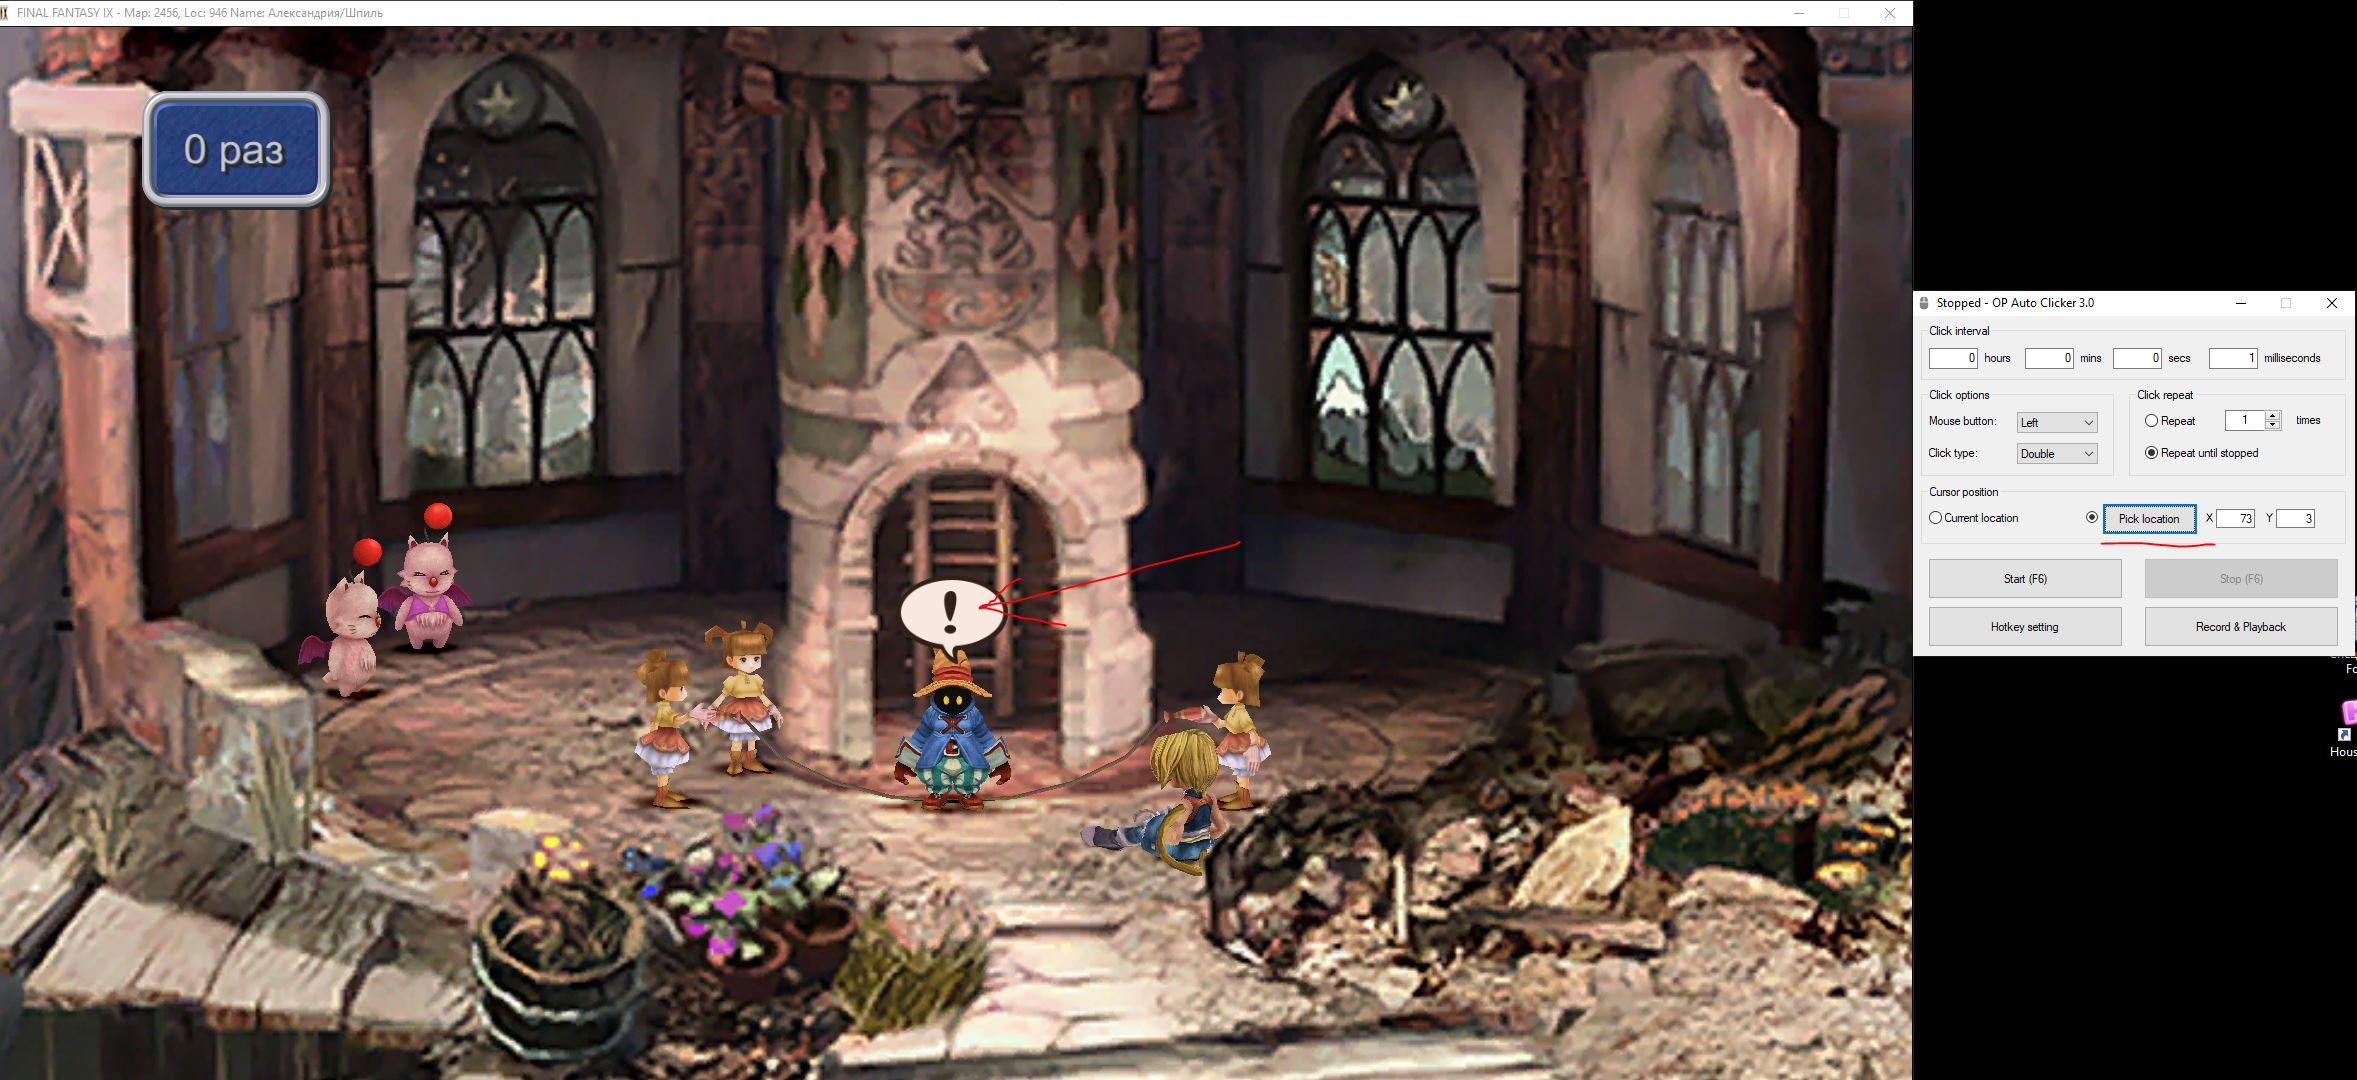 Достижение Hail to the King  Final Fantasy 9 на PC через кликер